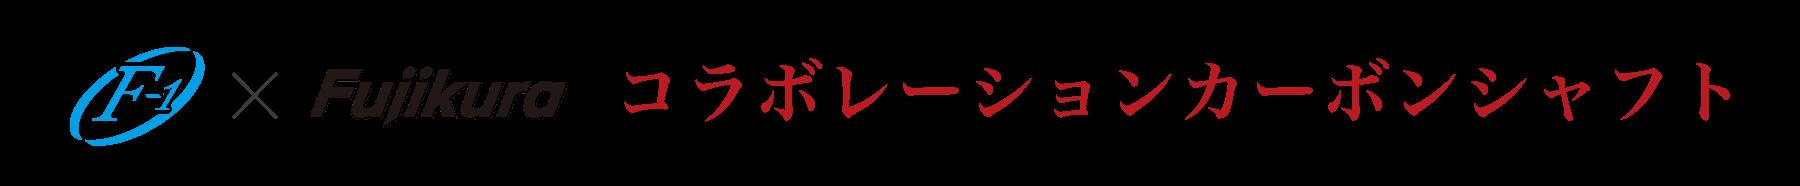 F-1×Fujikura コラボレーションカーボンシャフト